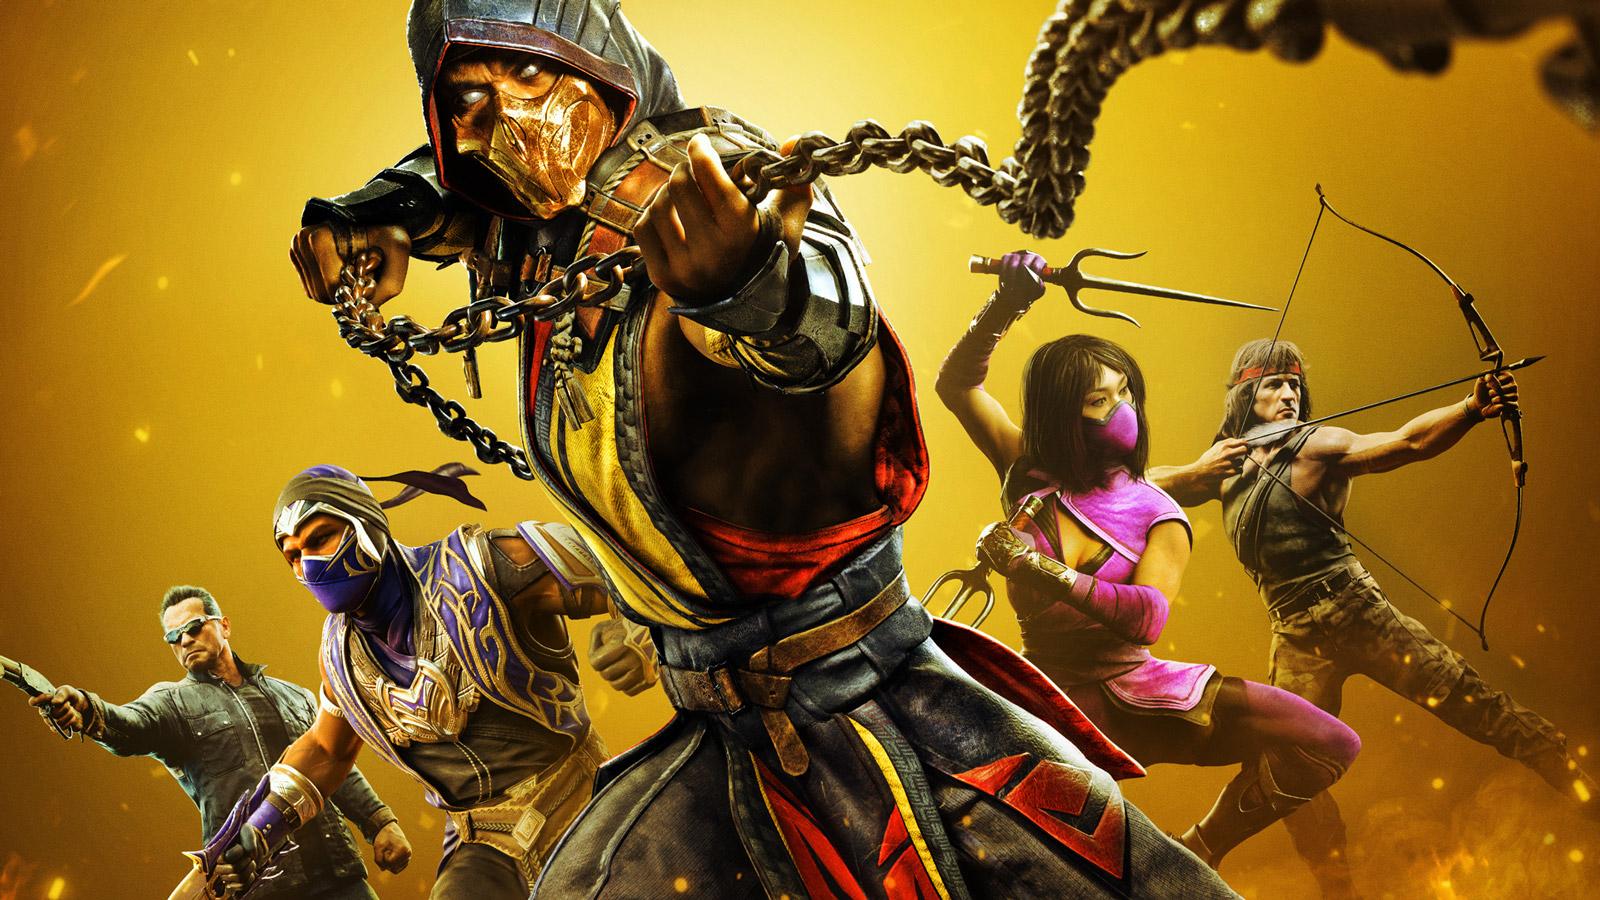 Mortal Kombat 11 Wallpaper in 1600x900